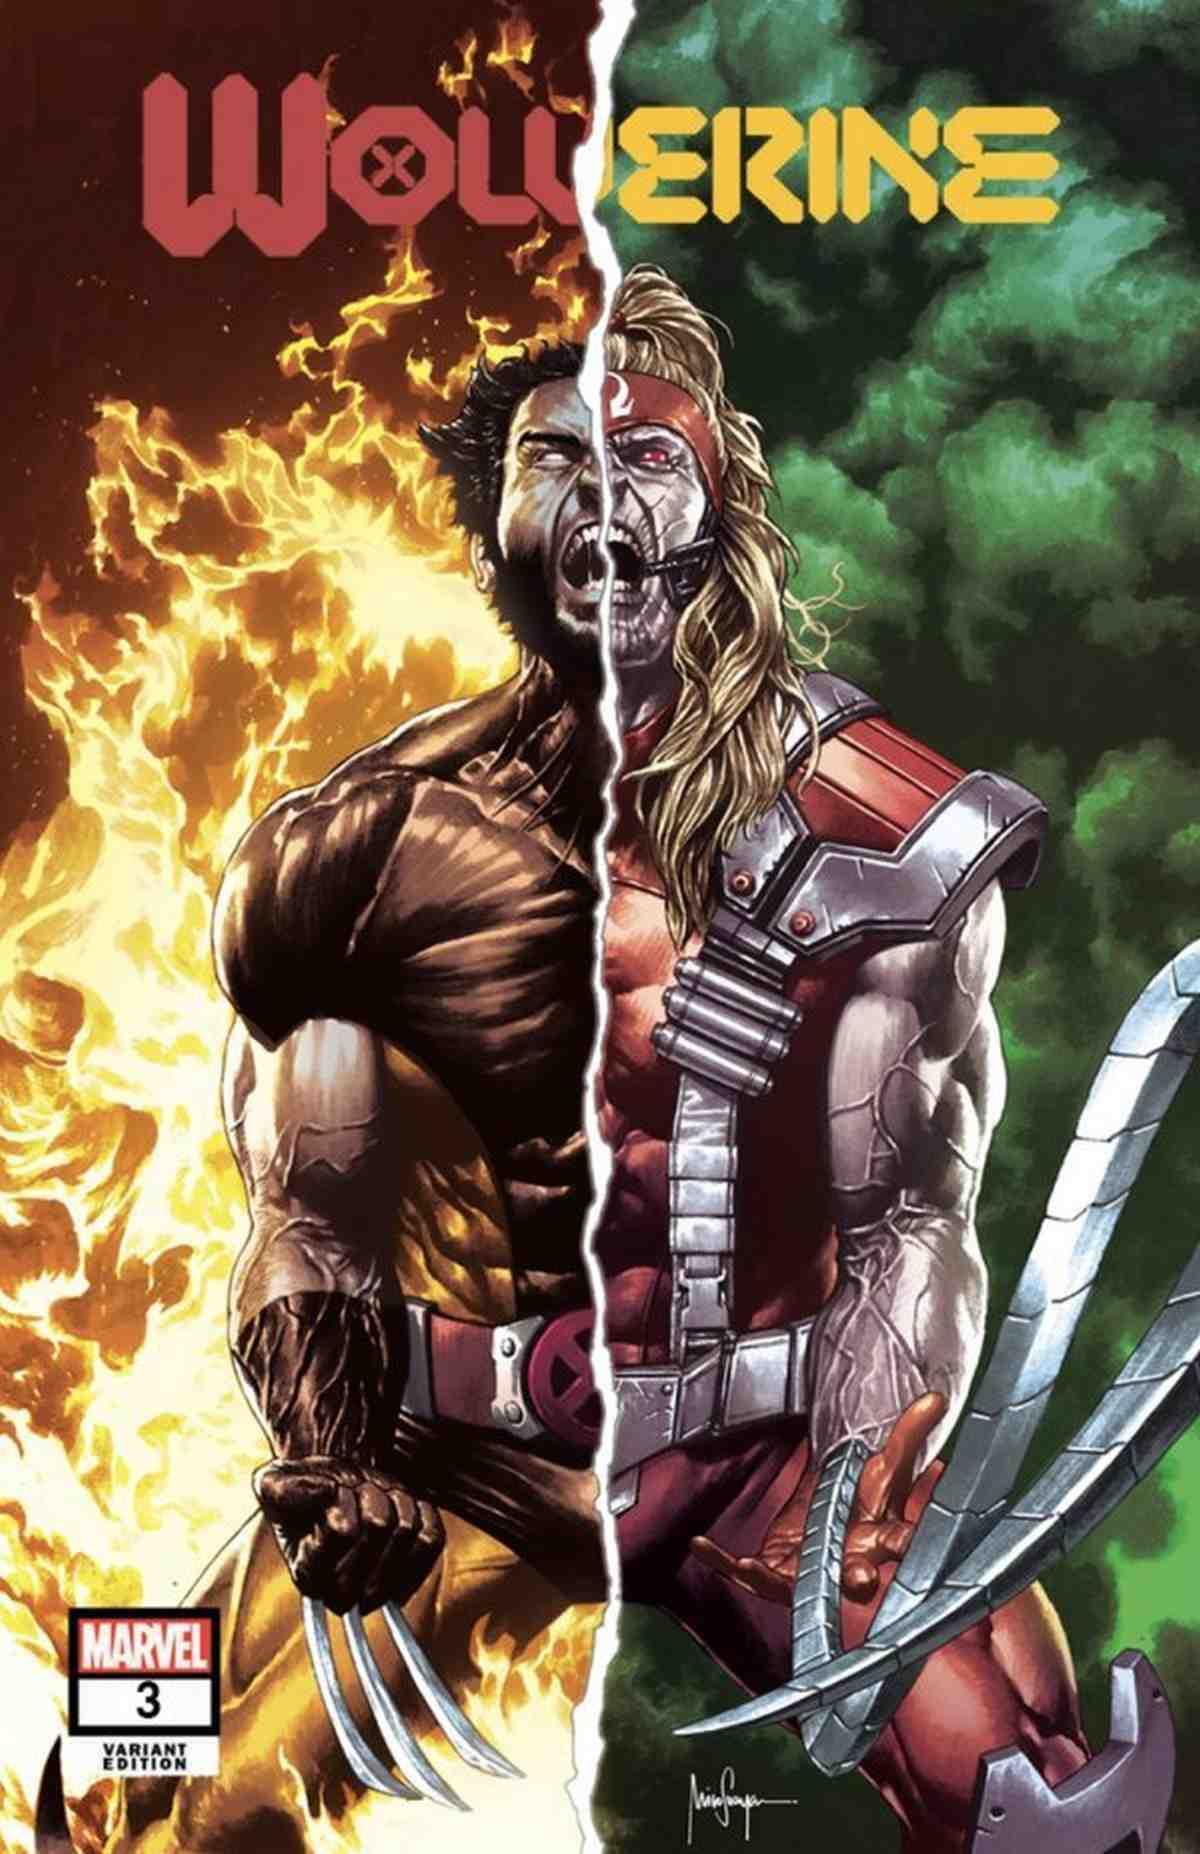 Wolverine 3 Mico Suayan Variant